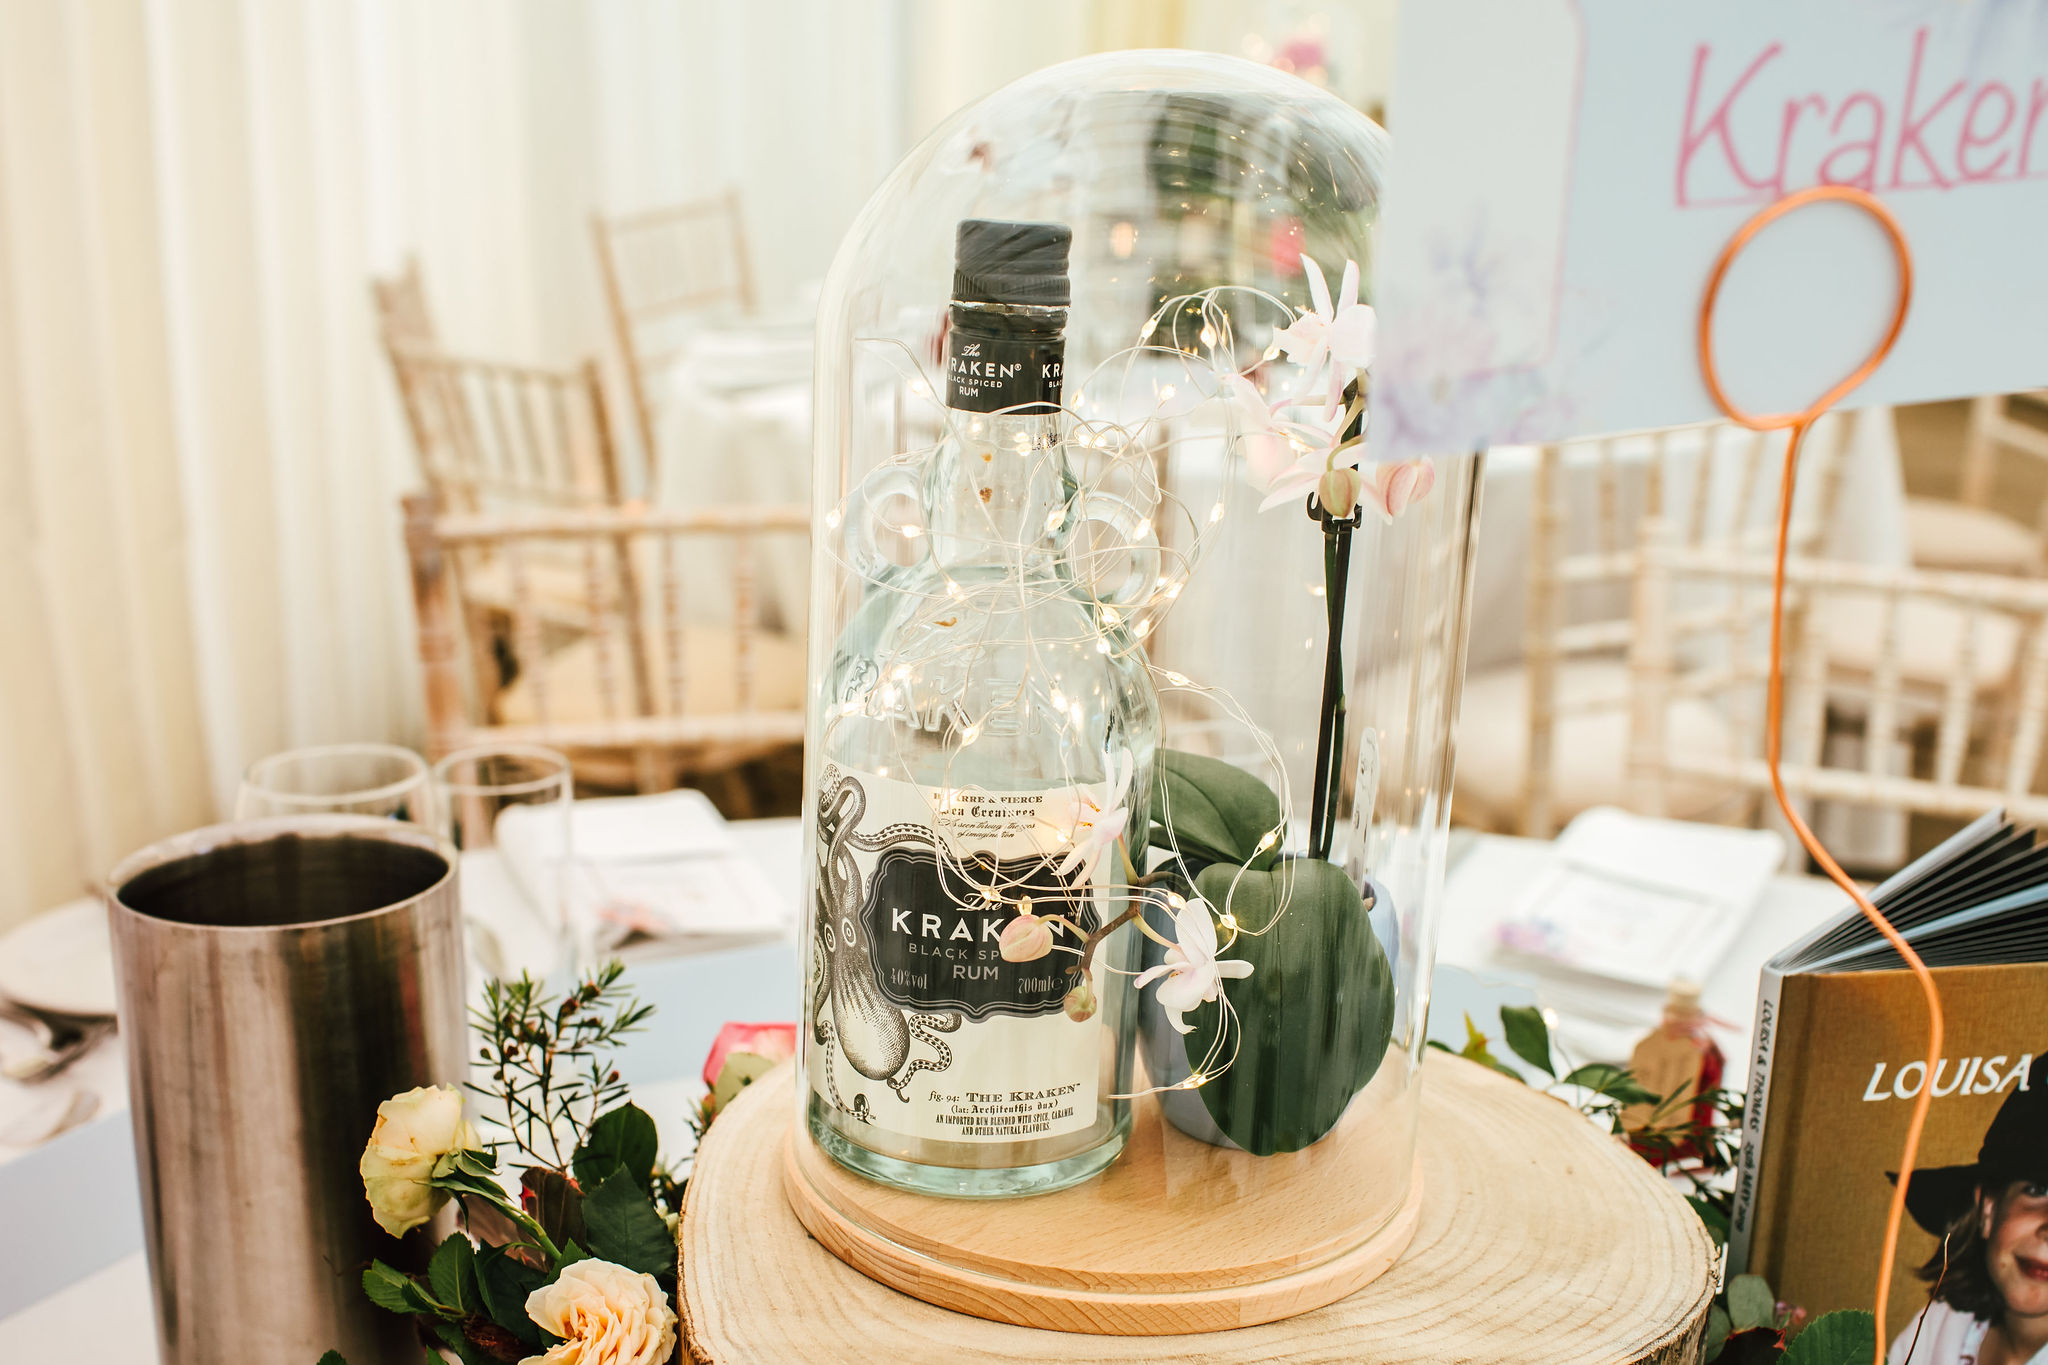 fiesta-fields-louisa-thomas-blog-table-decor-abigailwhite.jpg